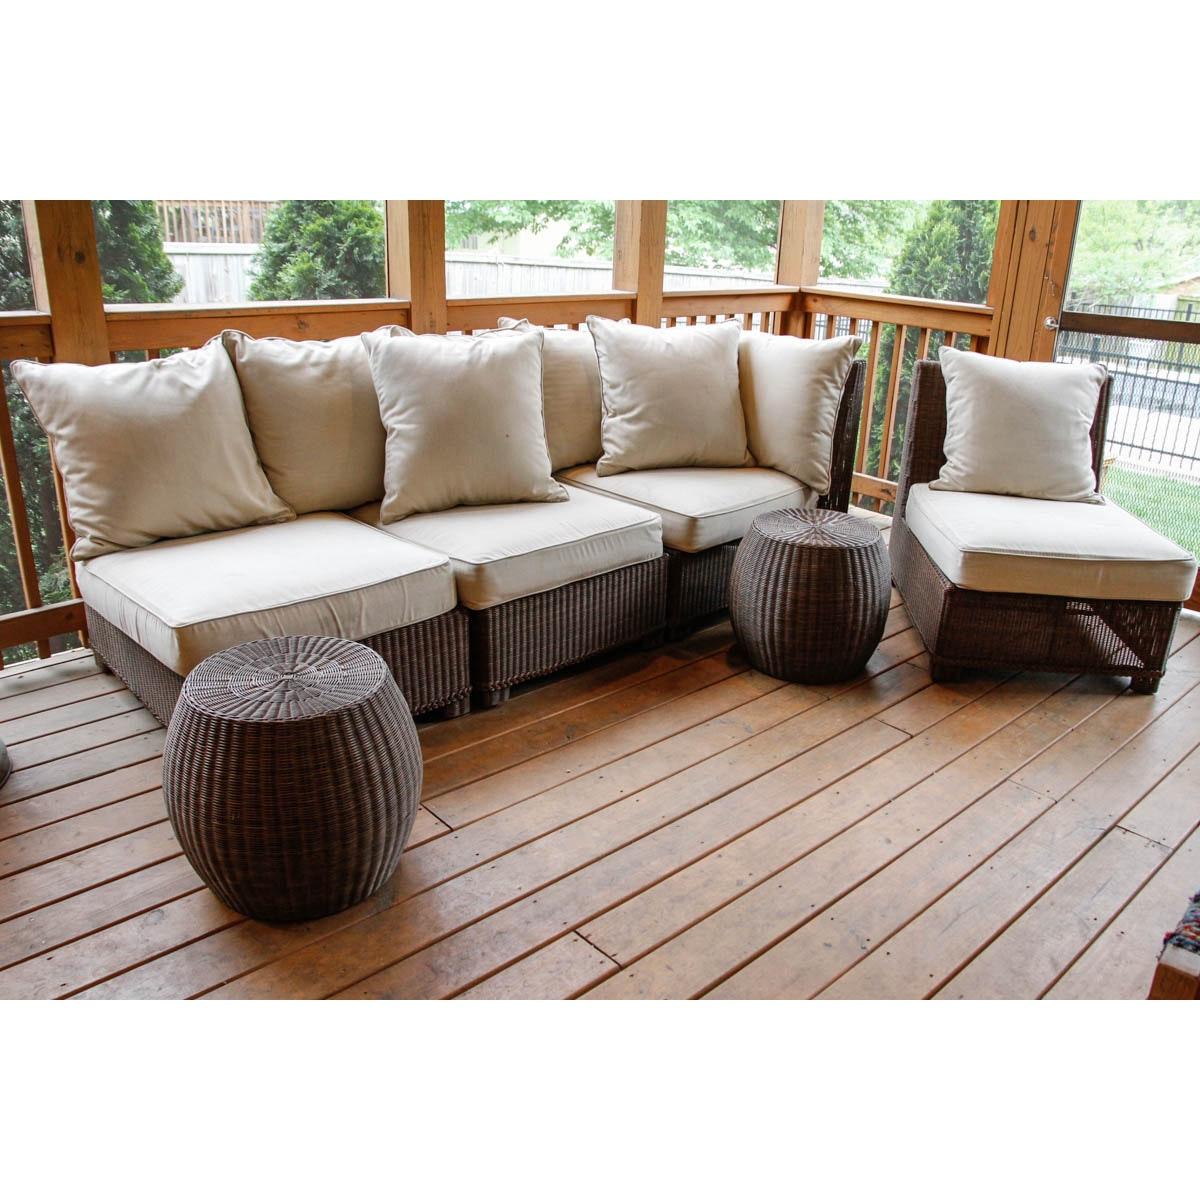 Modular Patio Sofa and Side Tables